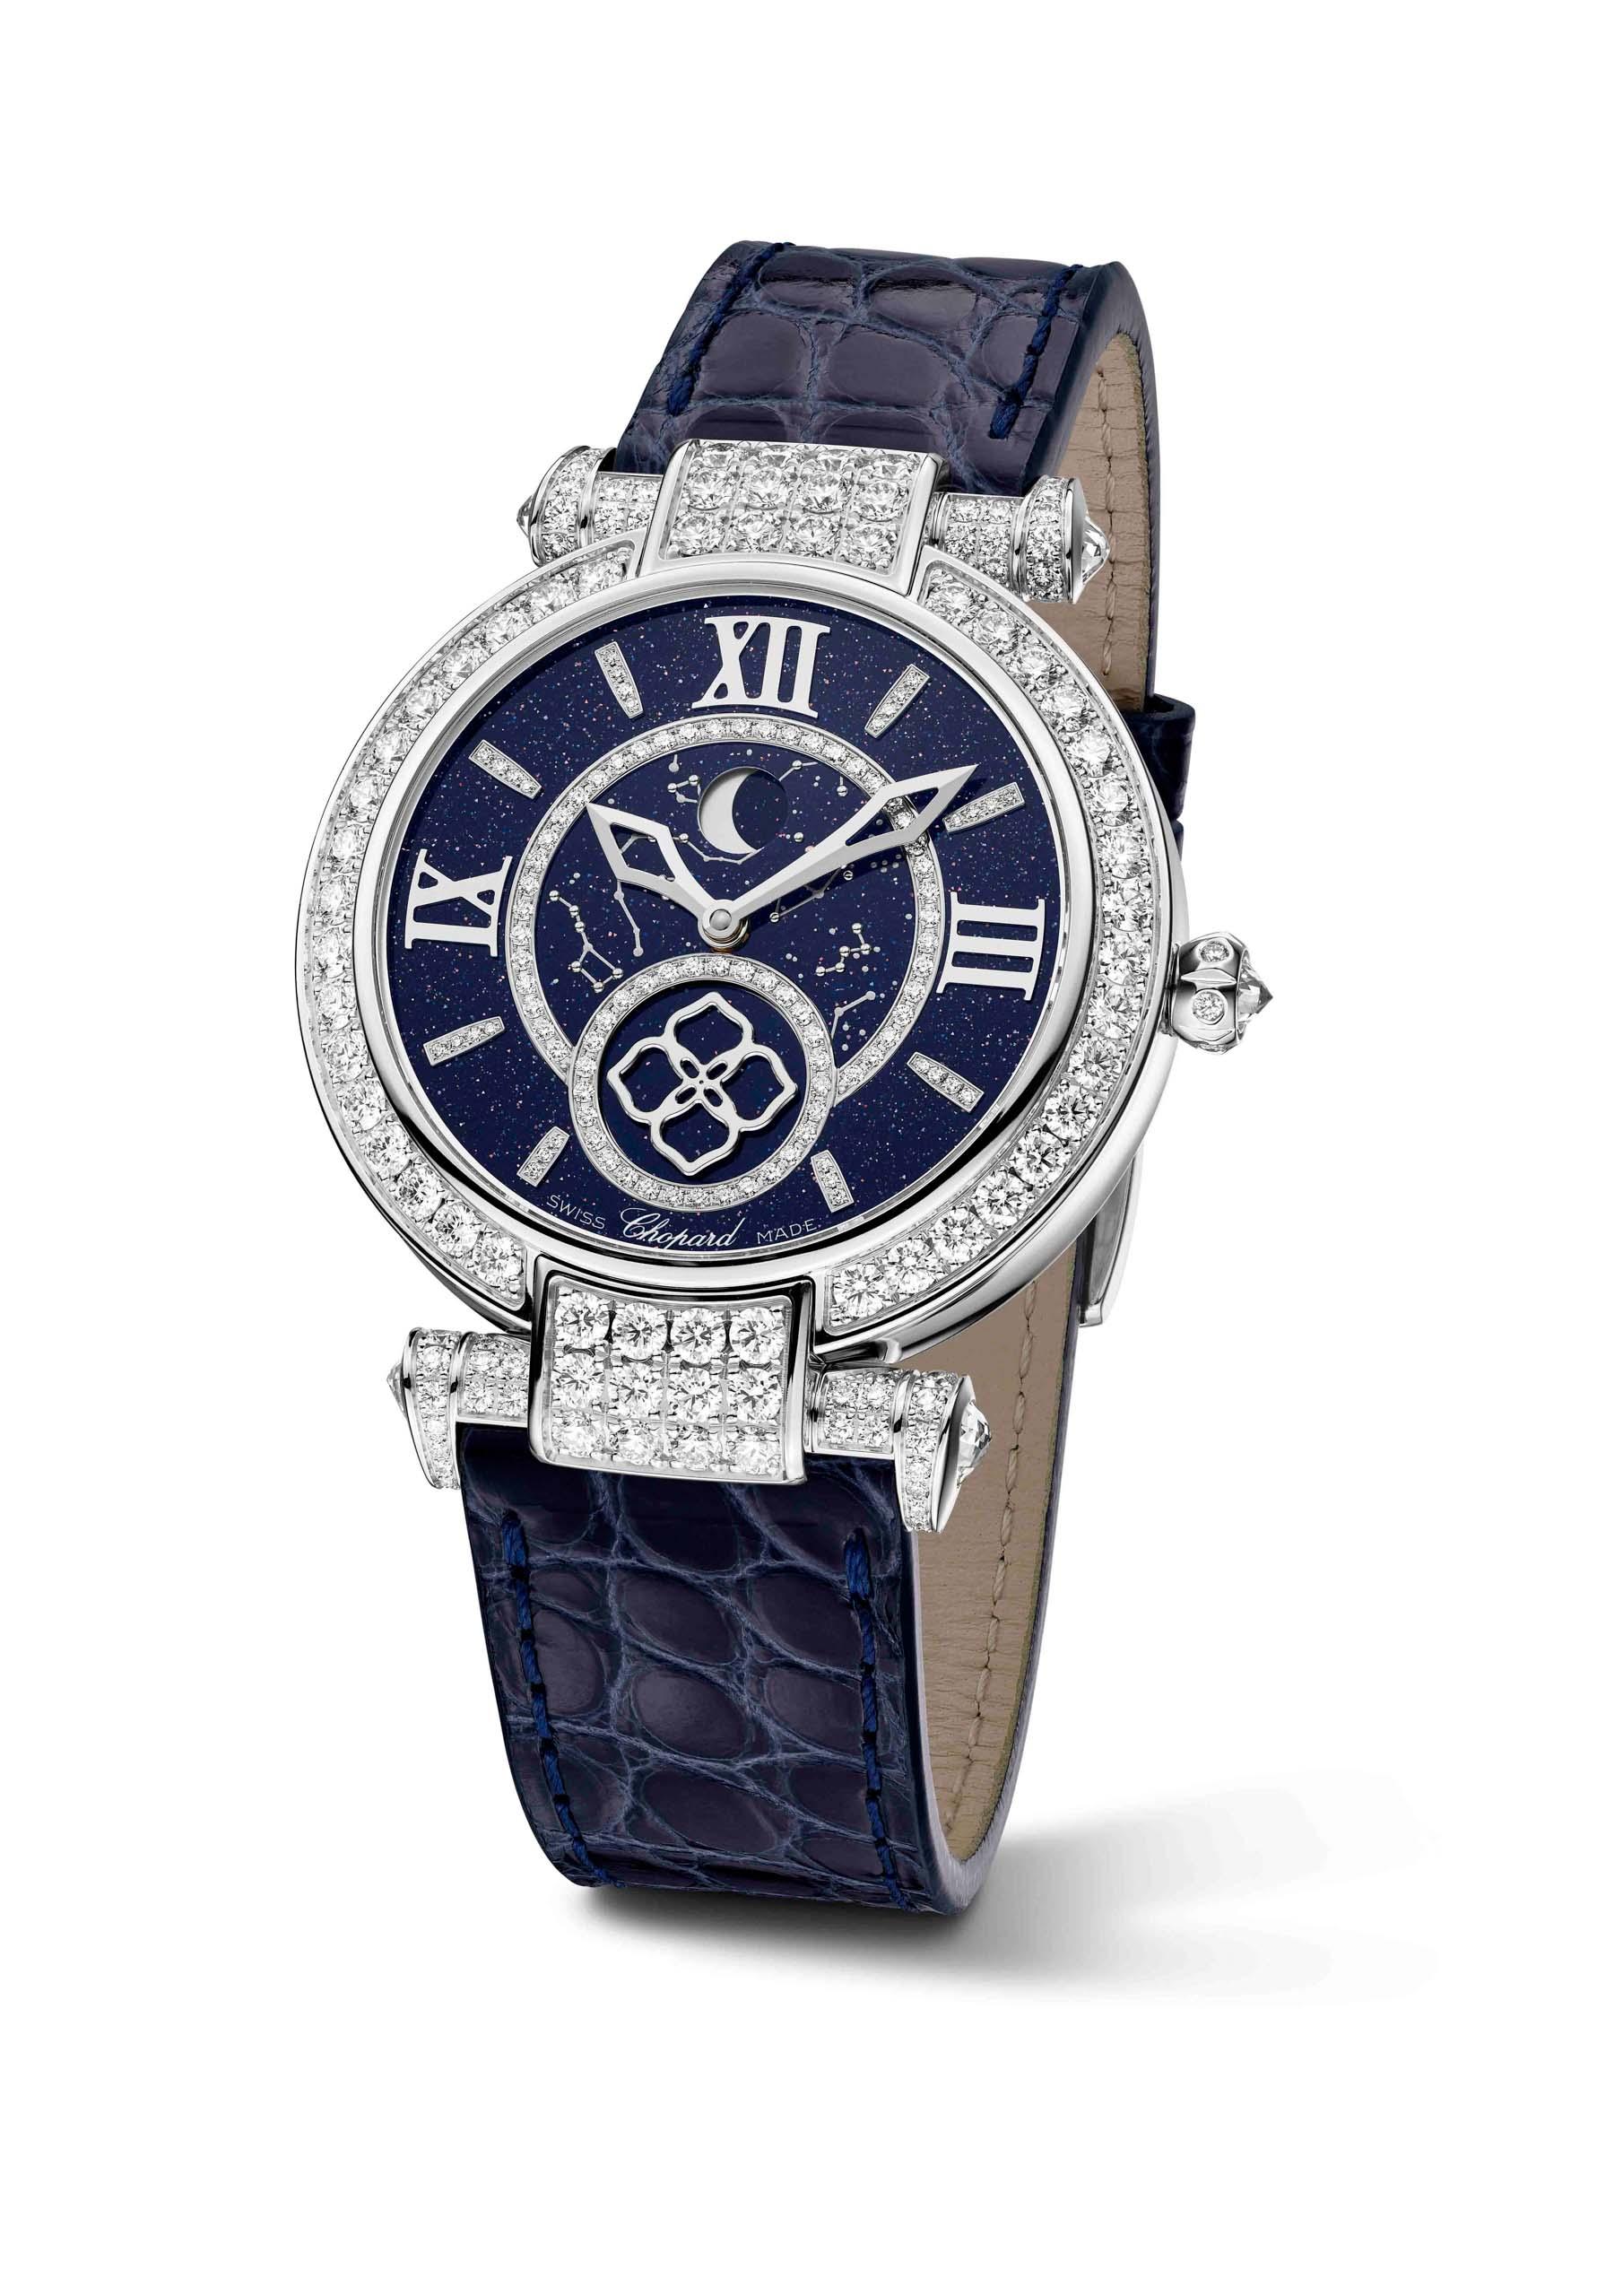 Chopard萧邦推出IMPERIALE月相腕表